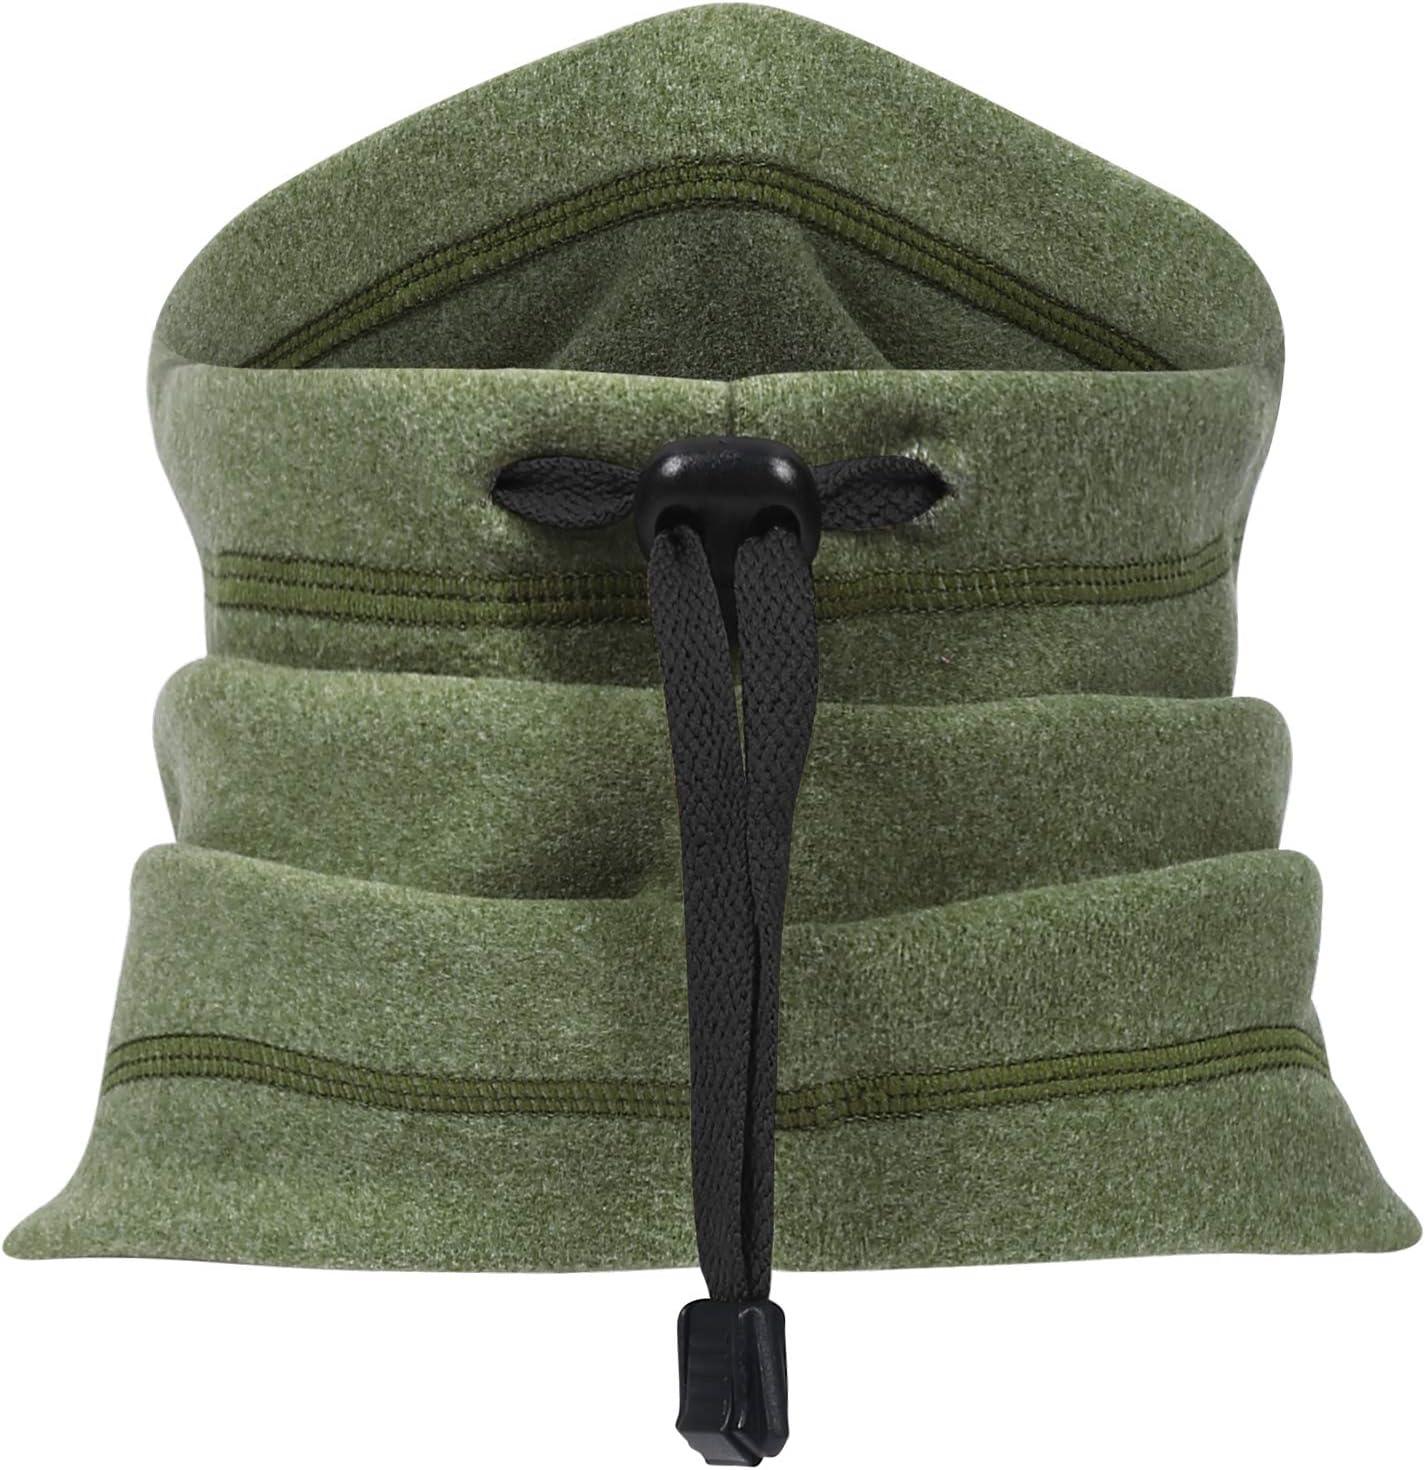 Arcweg Neck Warmer Drawstring Elastic Thermal Soft Windproof Men Women Breathable Neck Tube Scarf Fleece Universal Unisex Outdoor Neckwear Winter Balaclava Face Mask 11x13Inches